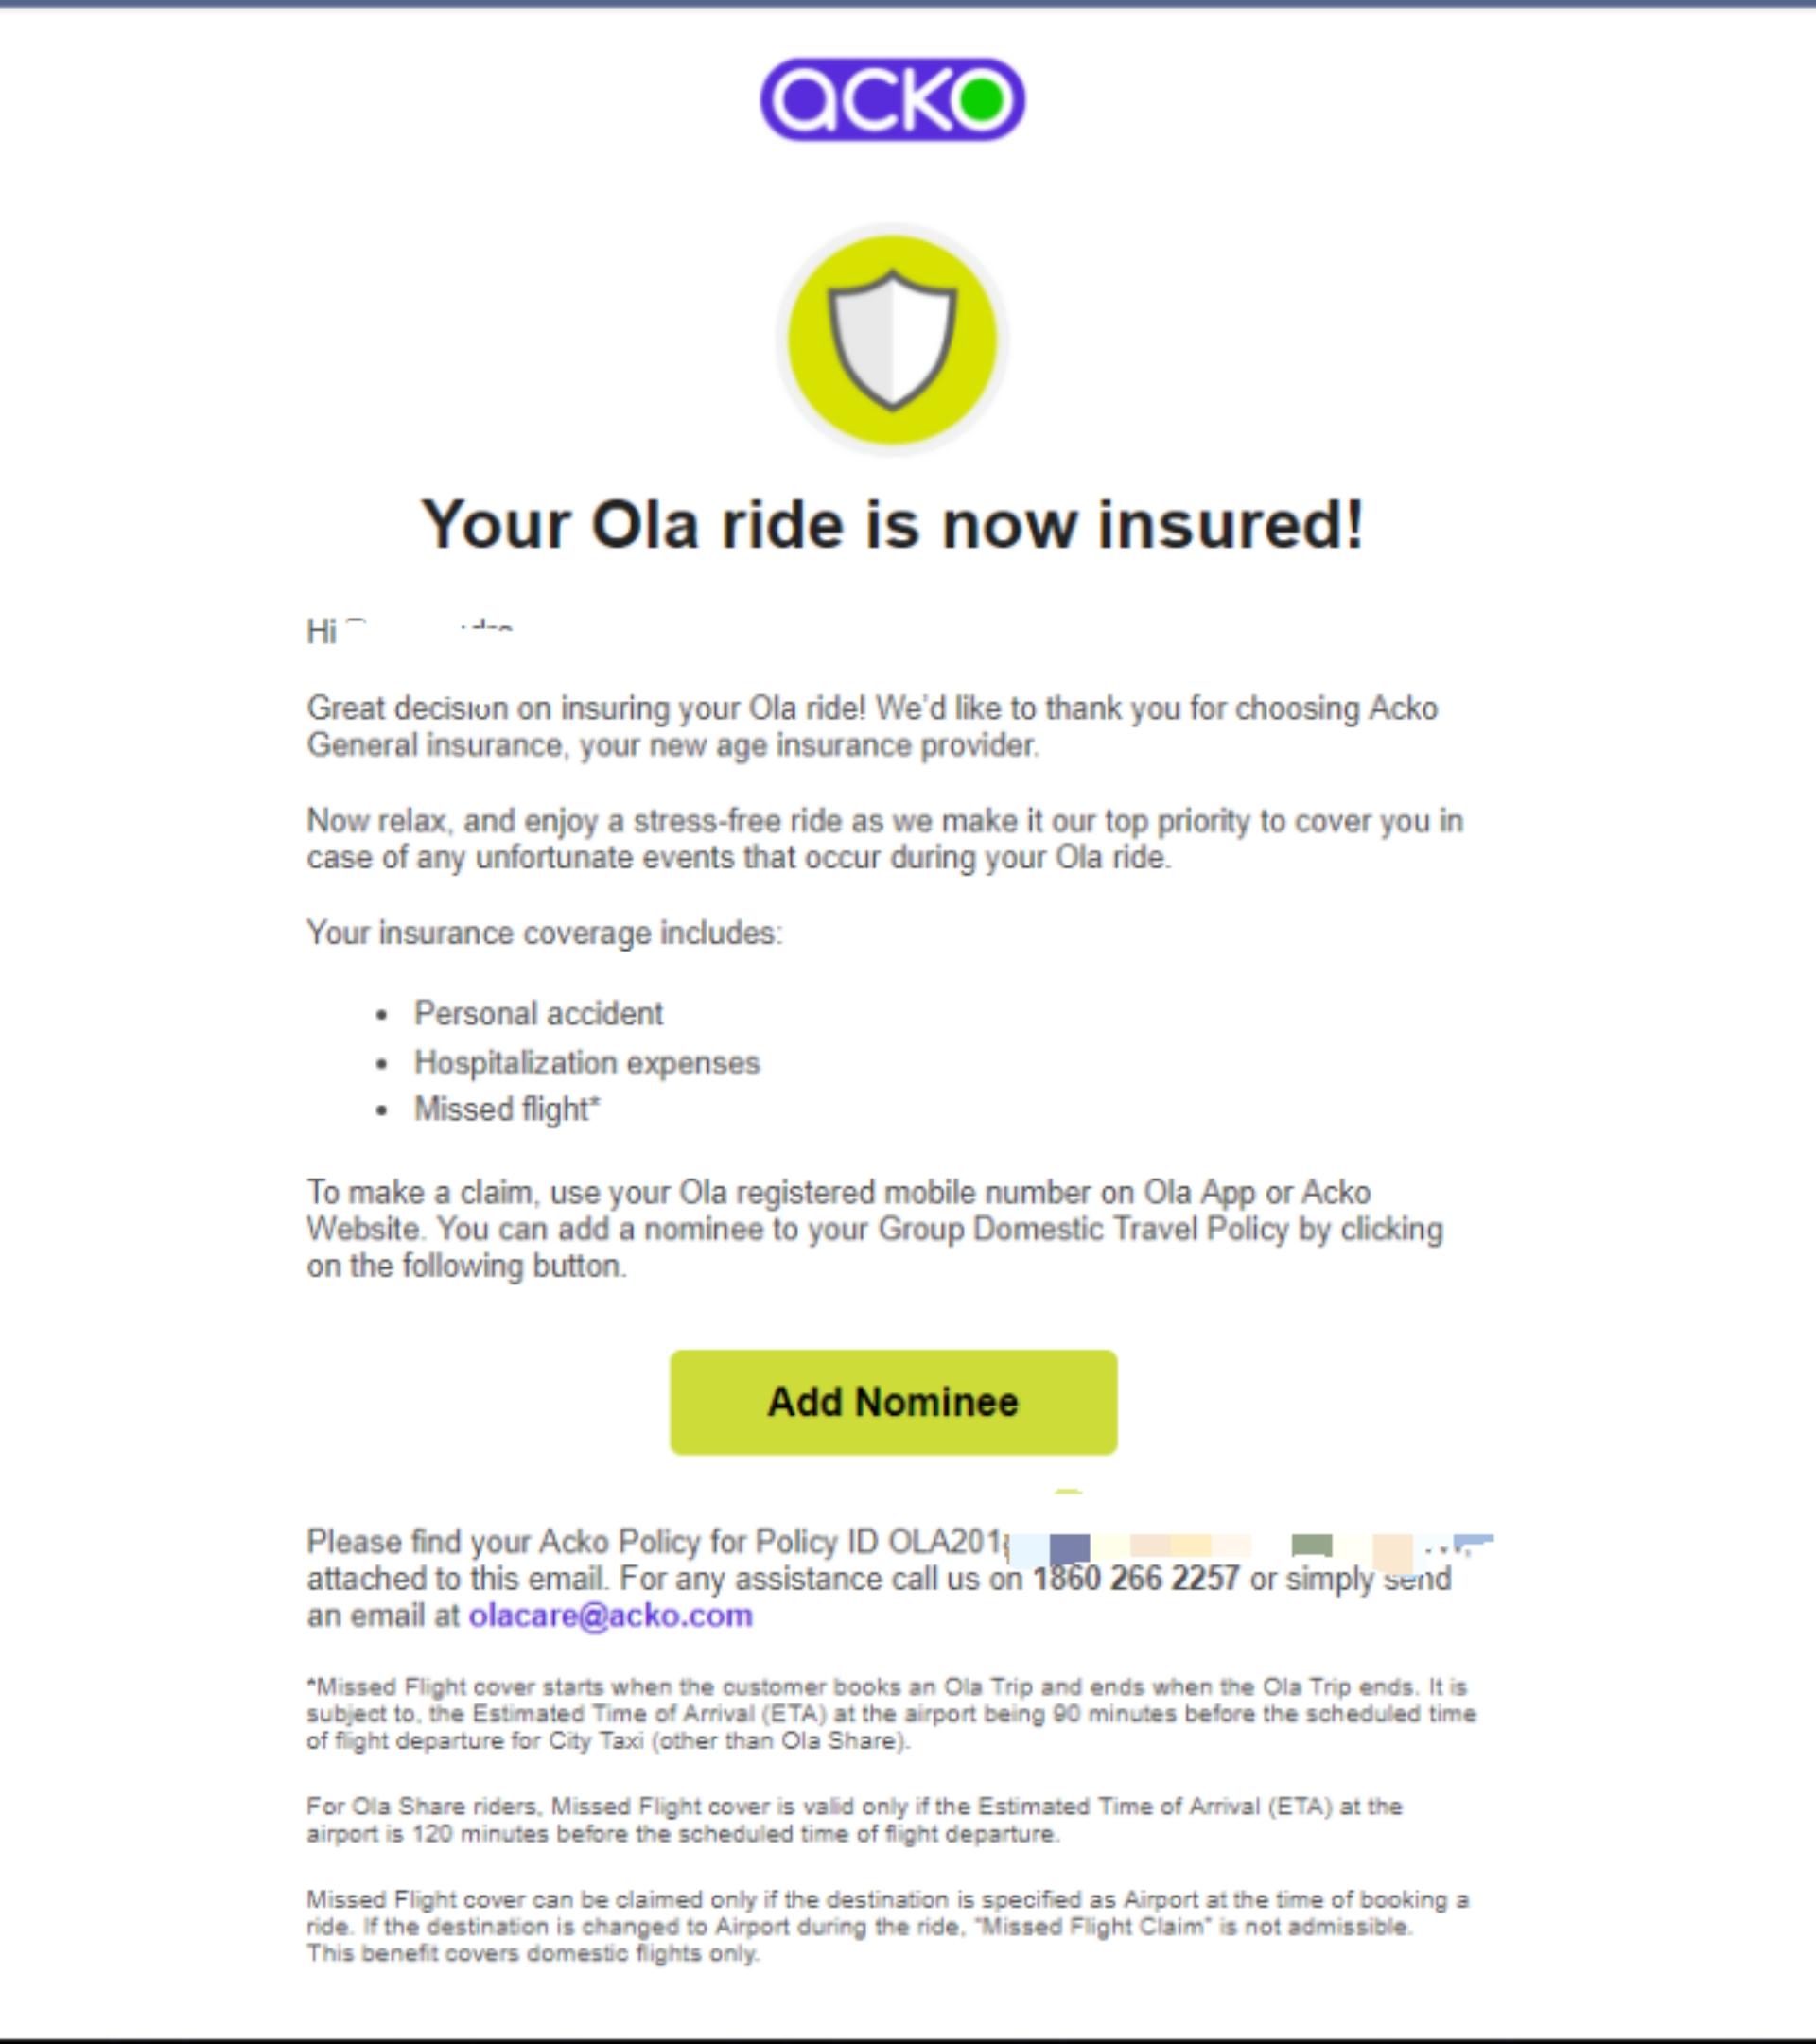 ola ride insurance